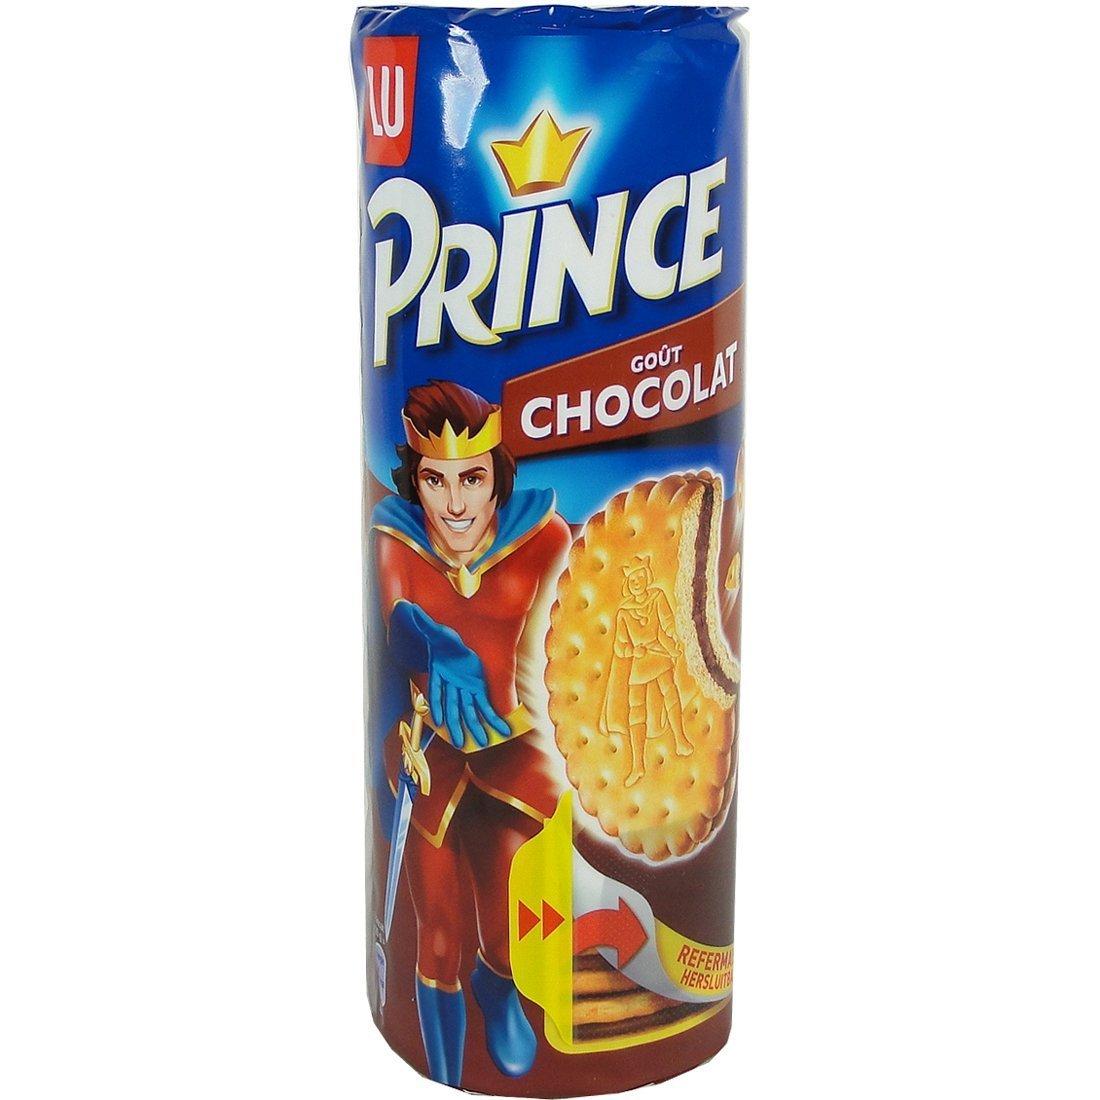 Choco Prince Lu French Chocolate Cookie 300g … (2 PACK)